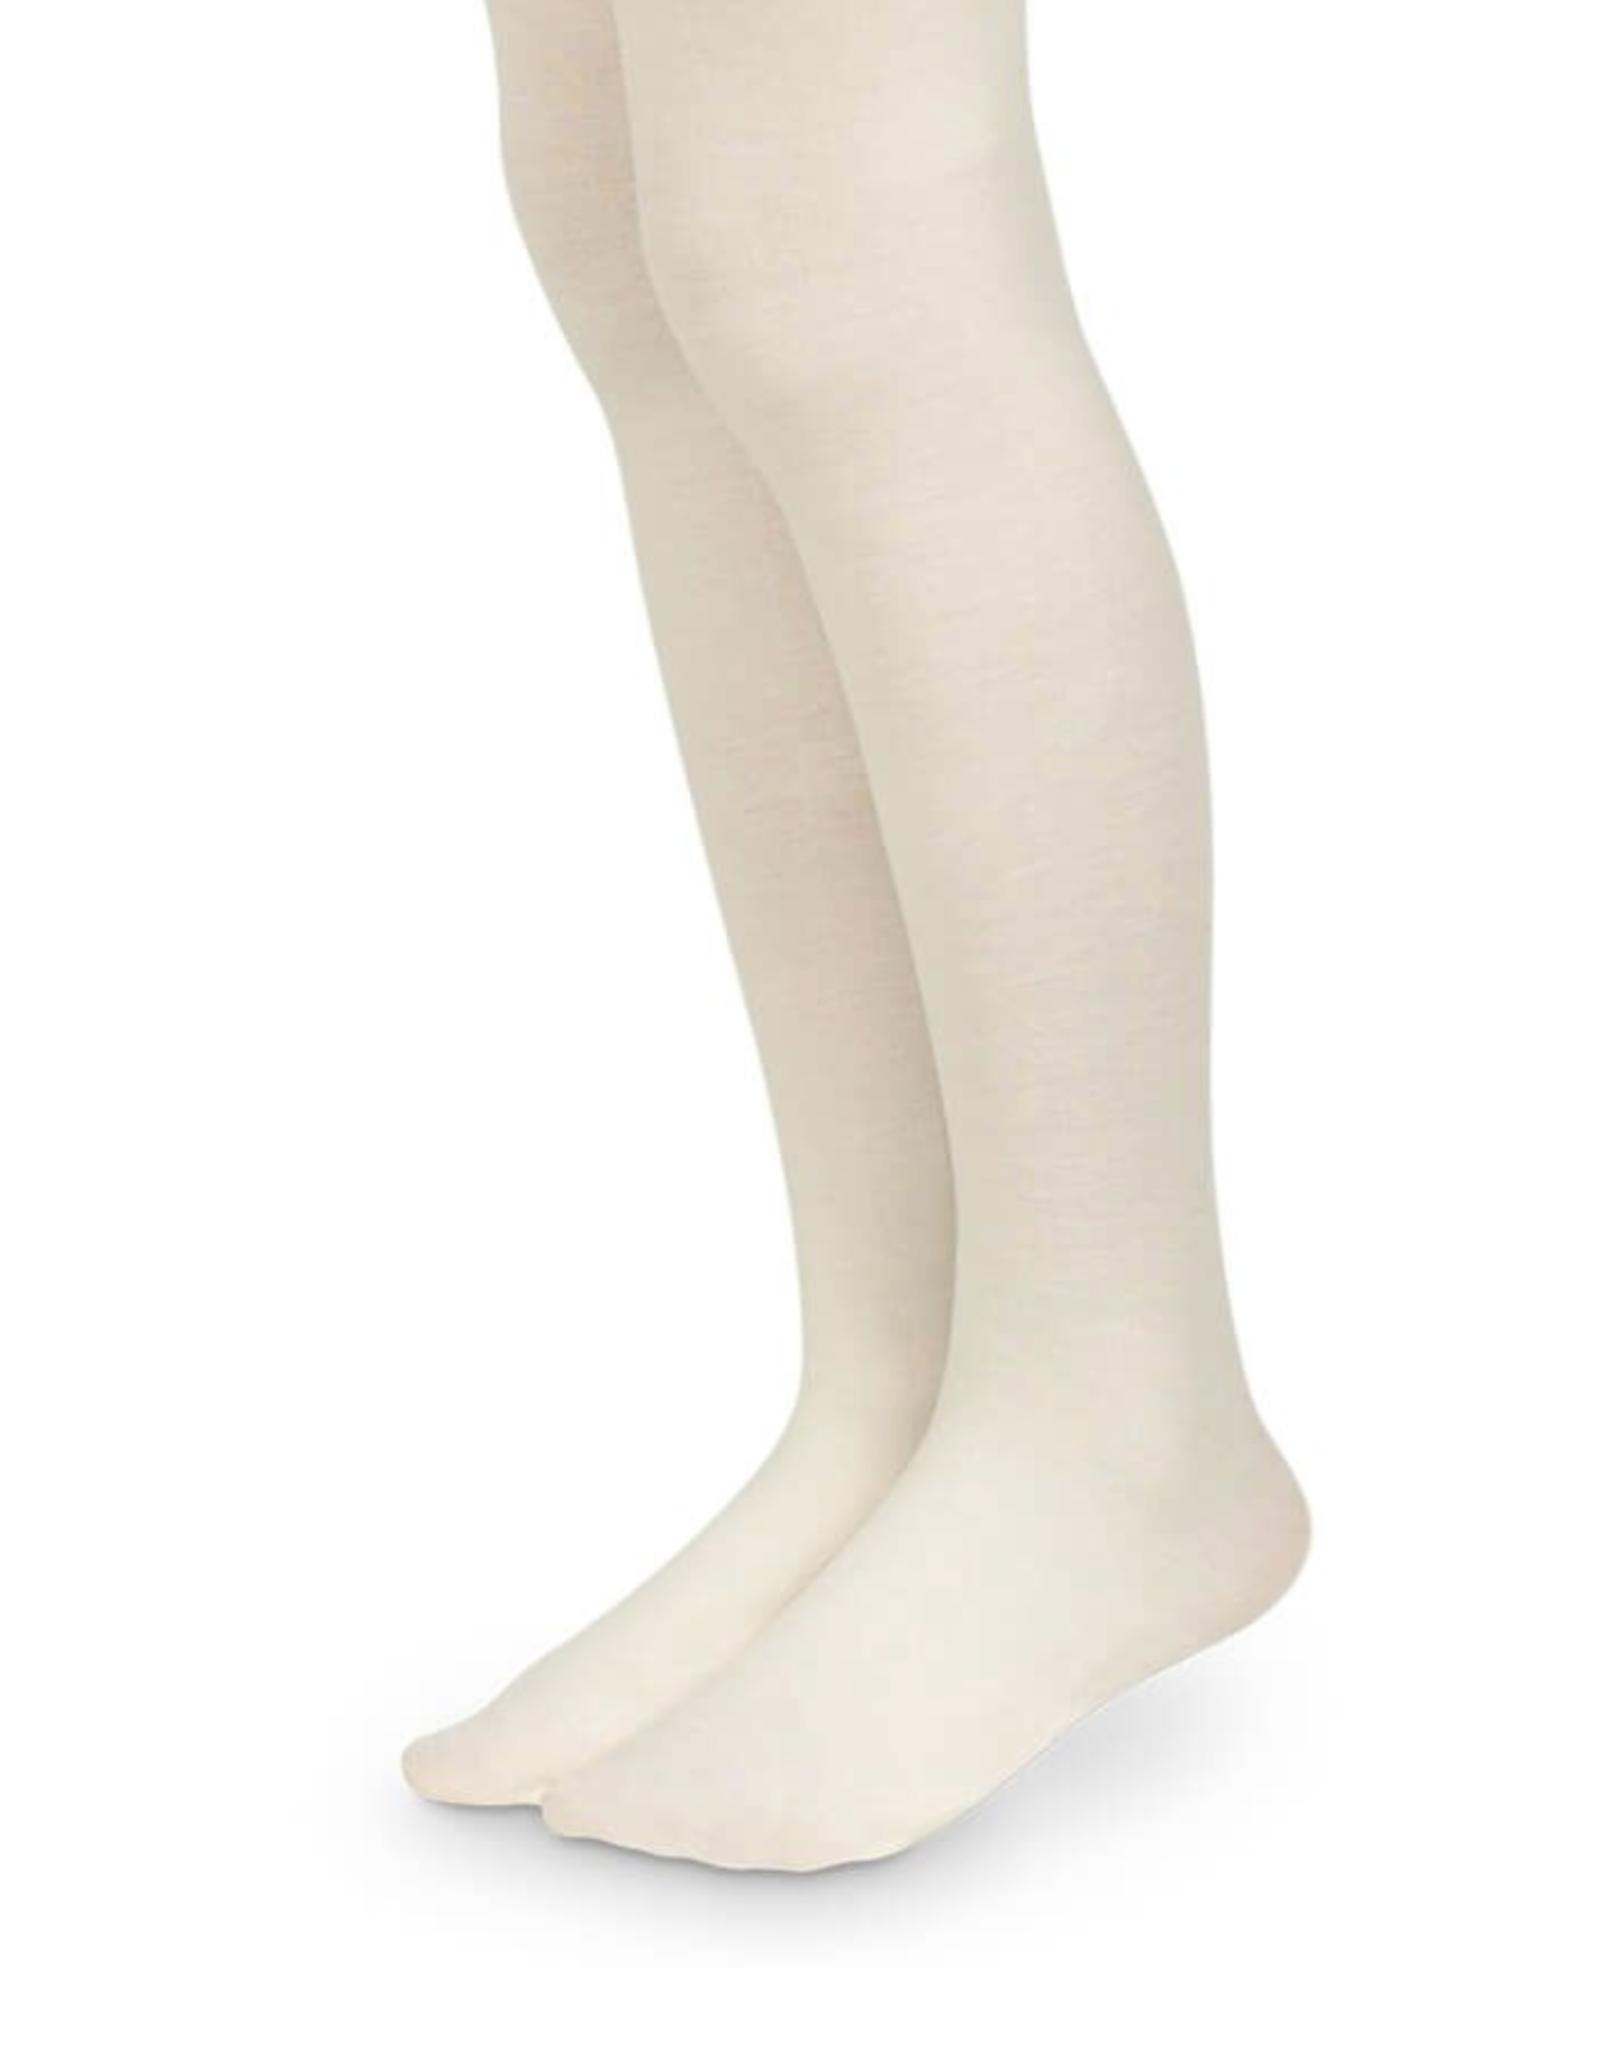 Jefferies Socks Ivory Nylon Tights 1445